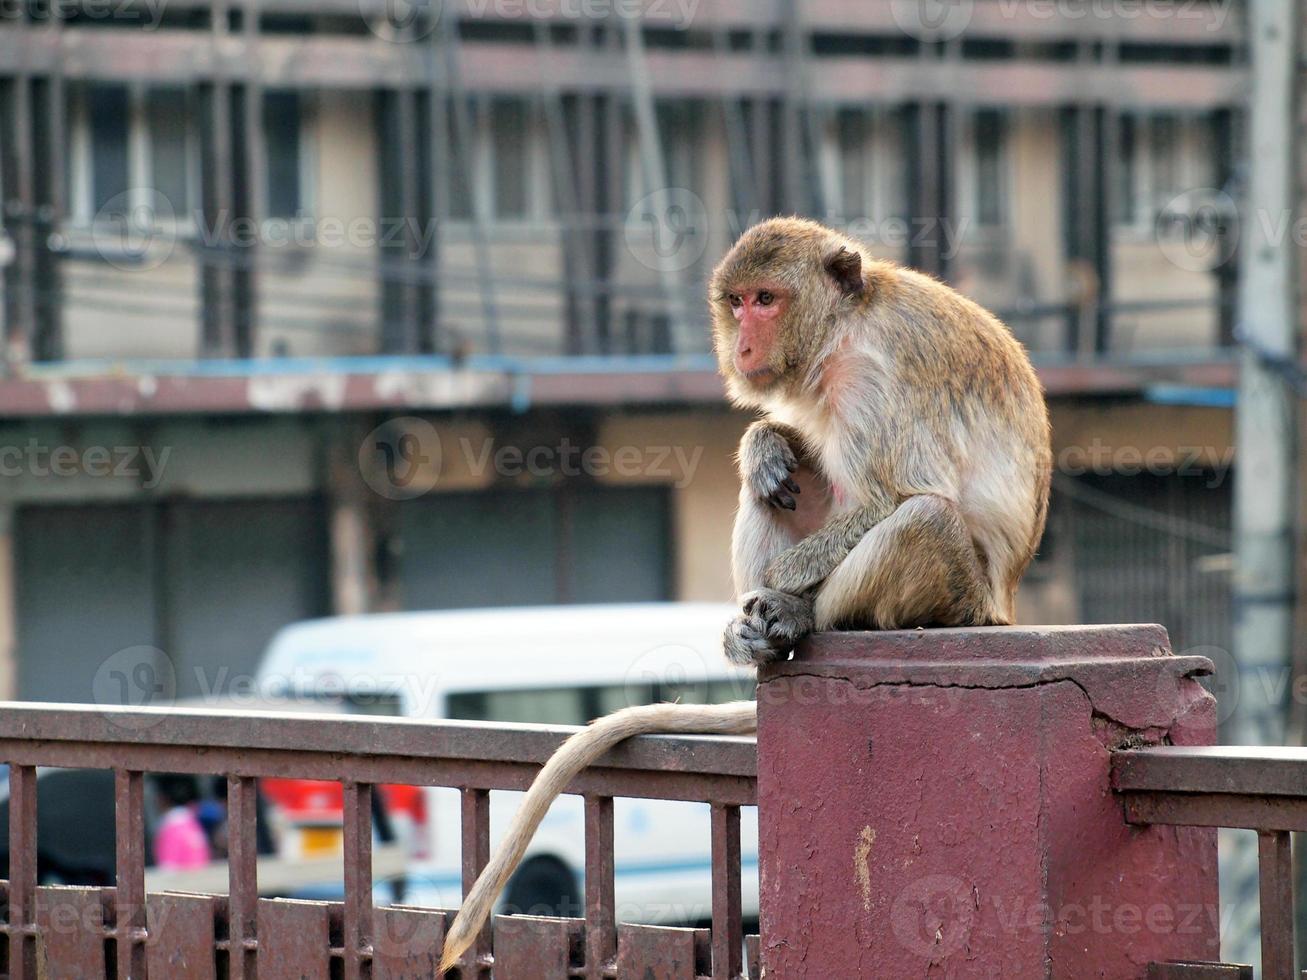 Monkey in Lop Buri Province Thailand photo